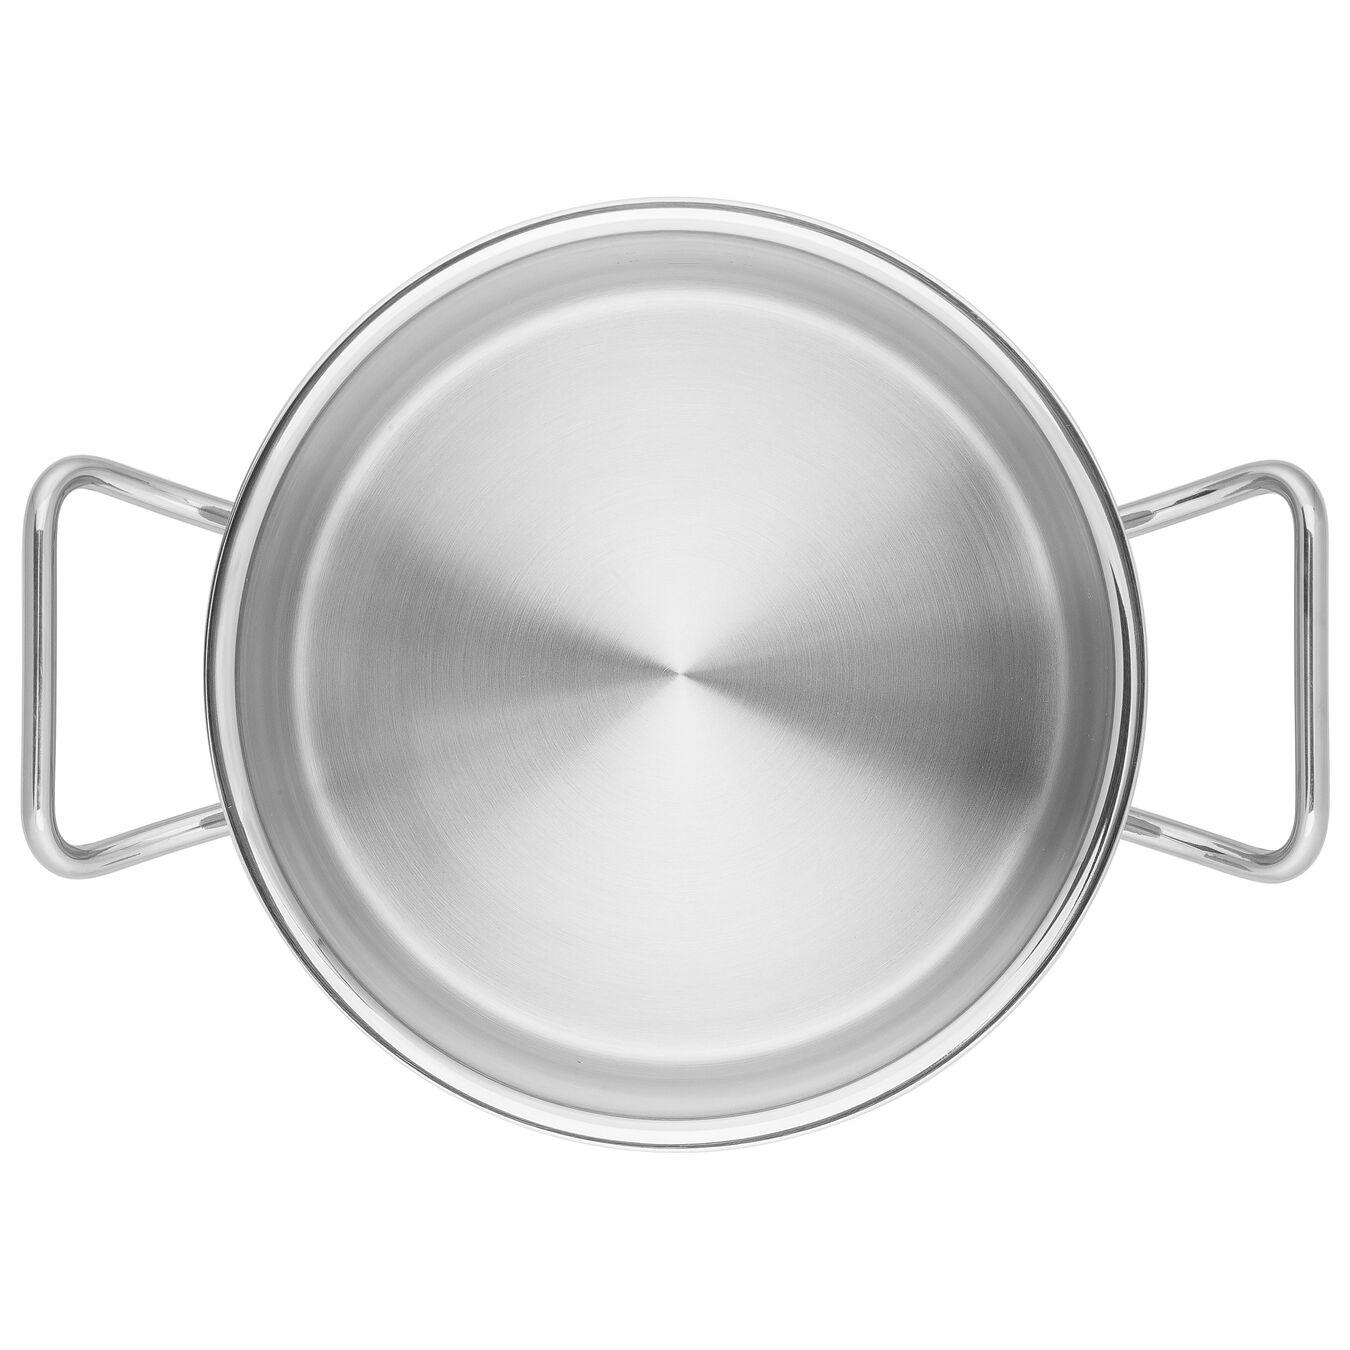 Tencere Seti | 18/10 Paslanmaz Çelik | 5-adet,,large 6